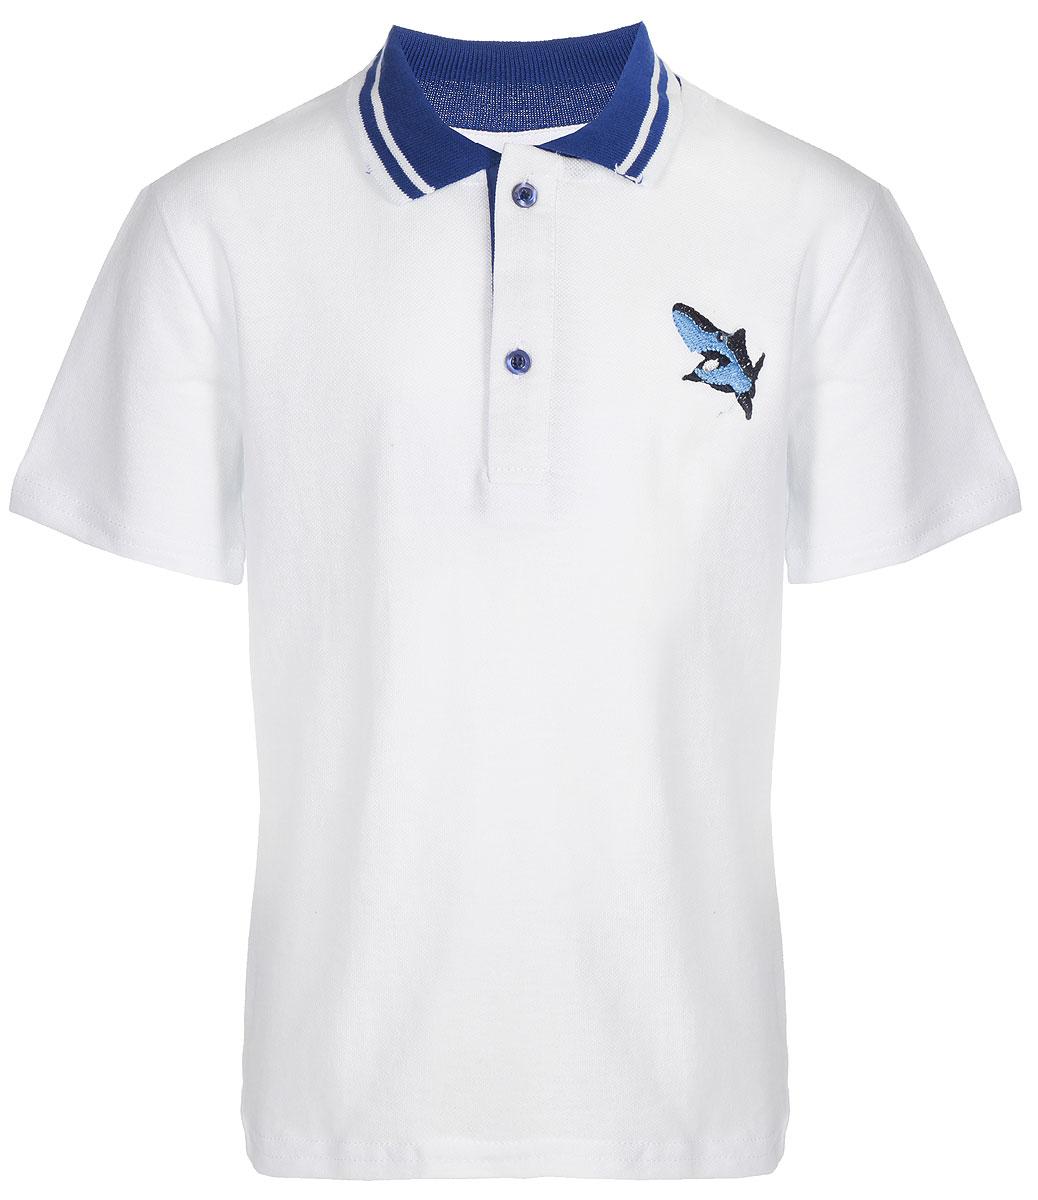 Поло для мальчика Arge Fashion, цвет: белый. УЗТ-ФПМ-100-3. Размер 116УЗТ-ФПМ-100-3